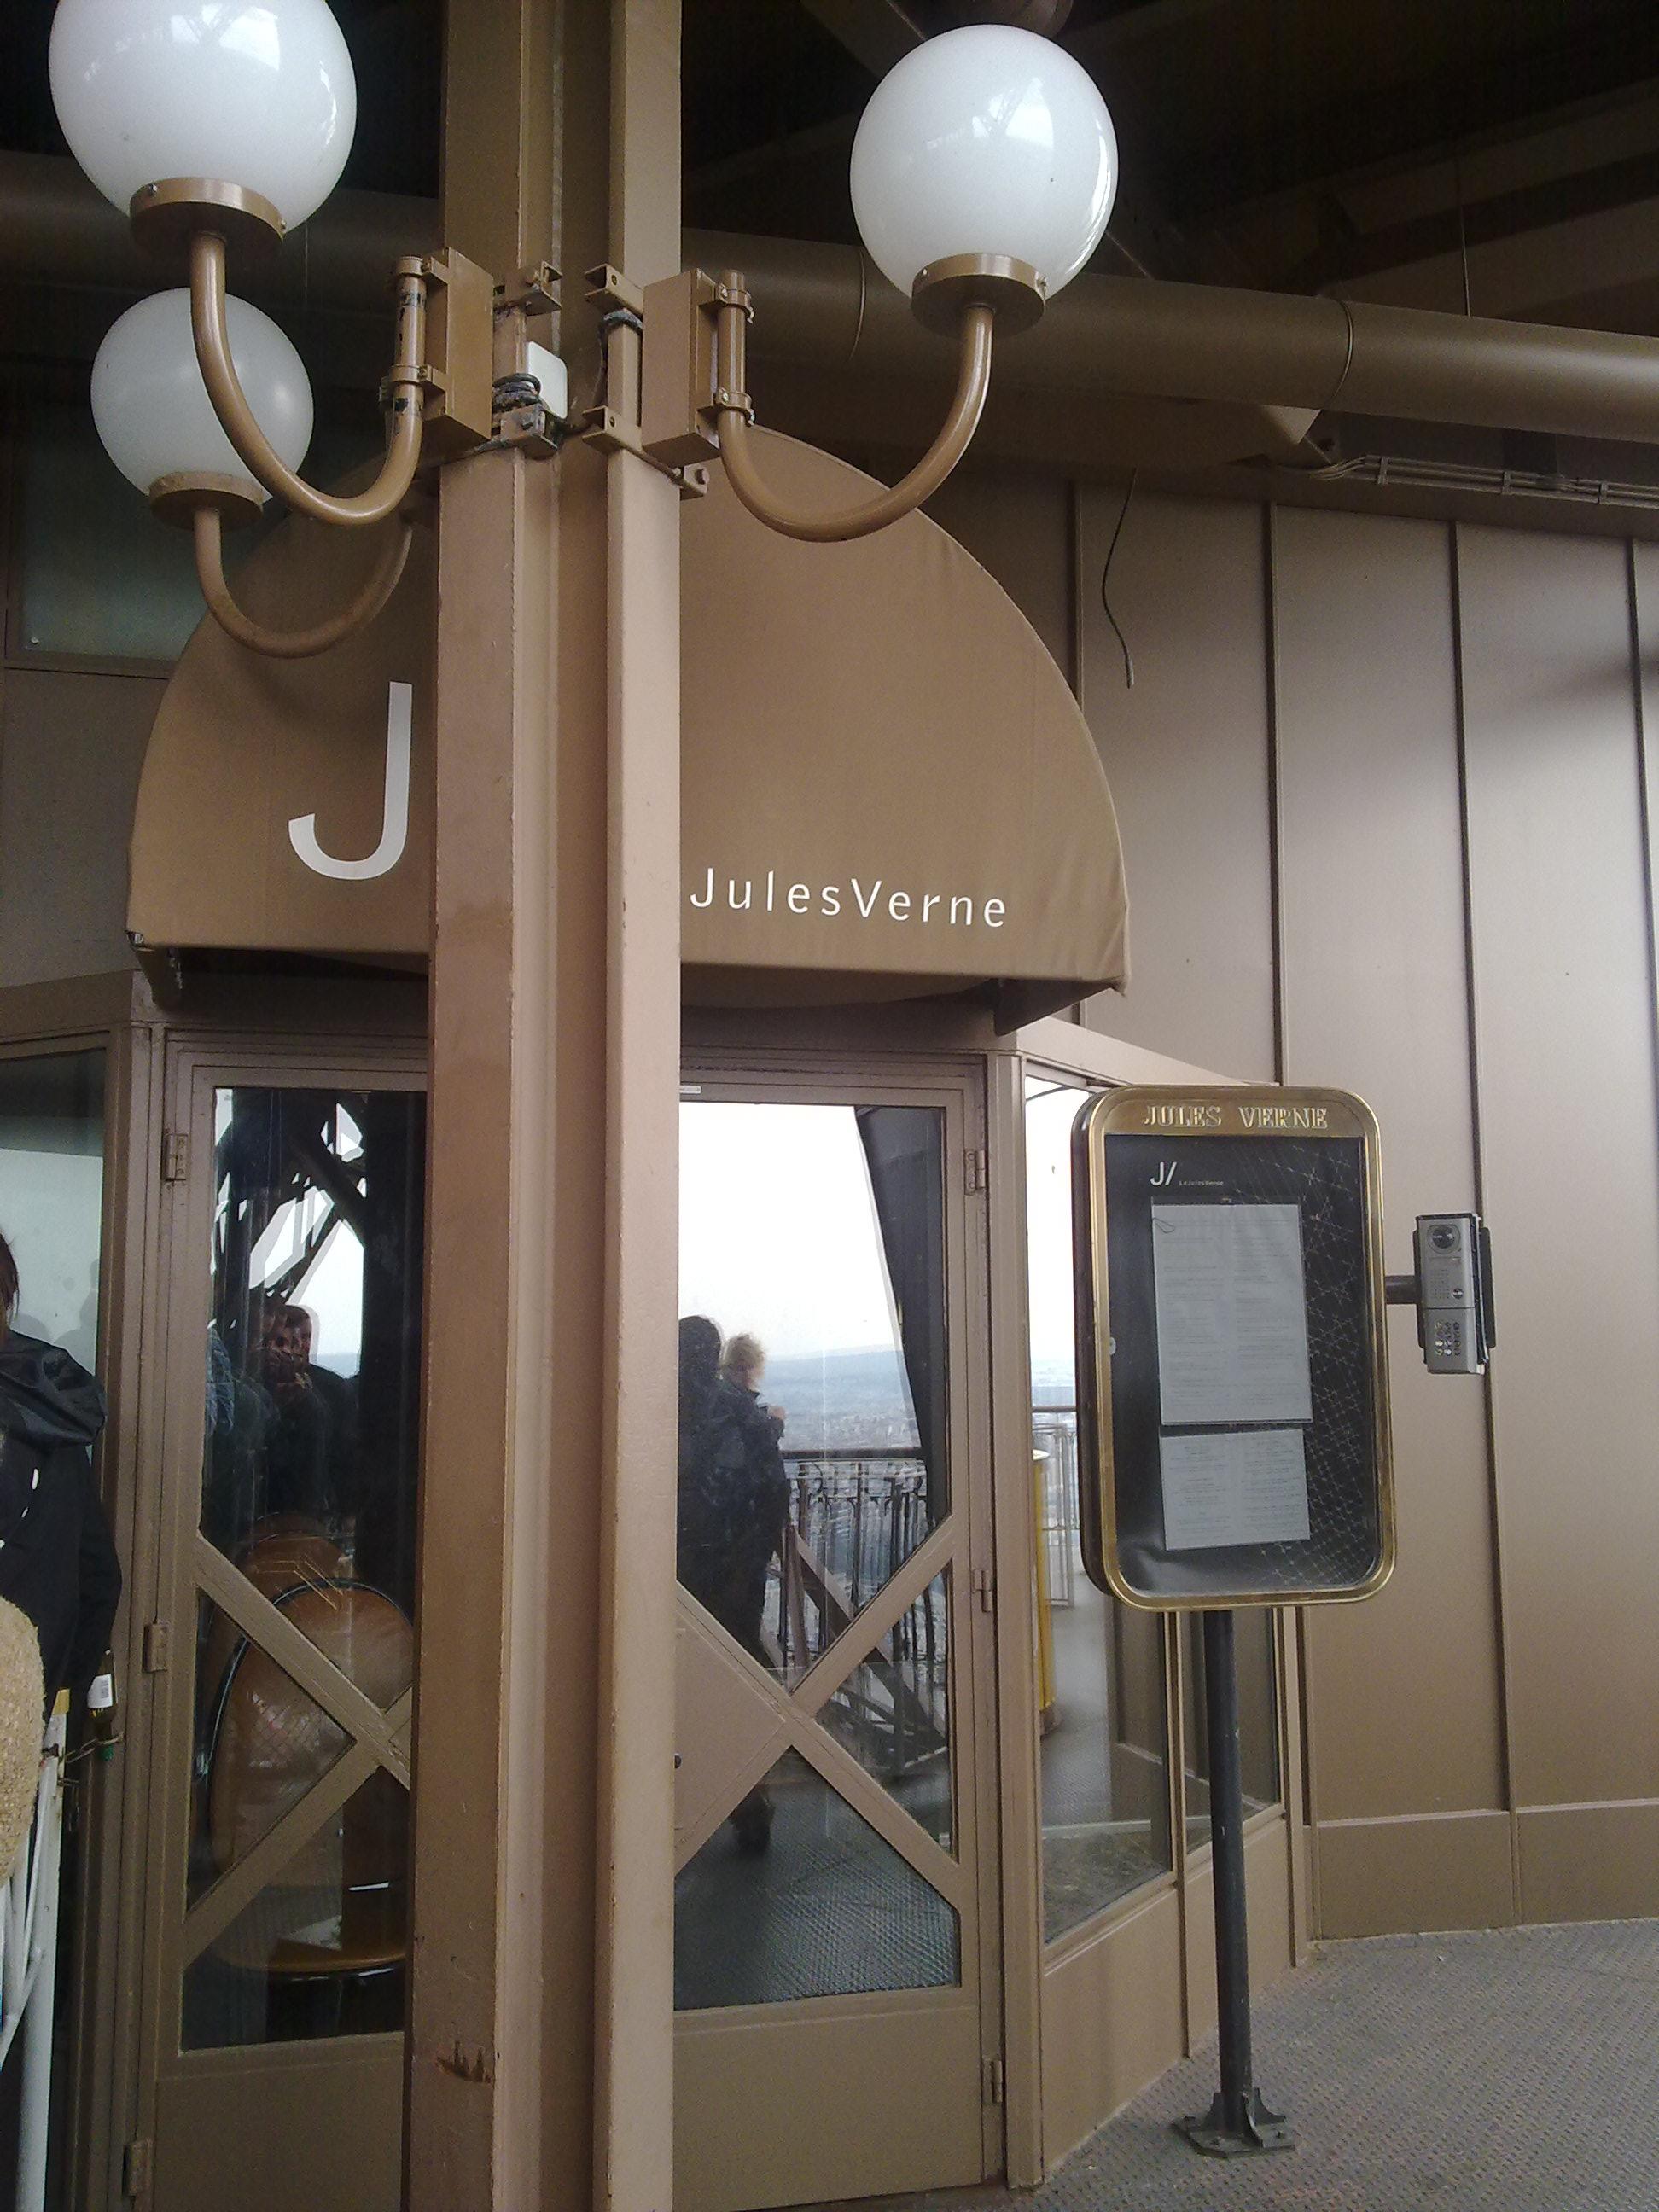 La maravilla de la torre eiffel 21 wonders - Restaurante julio verne ...